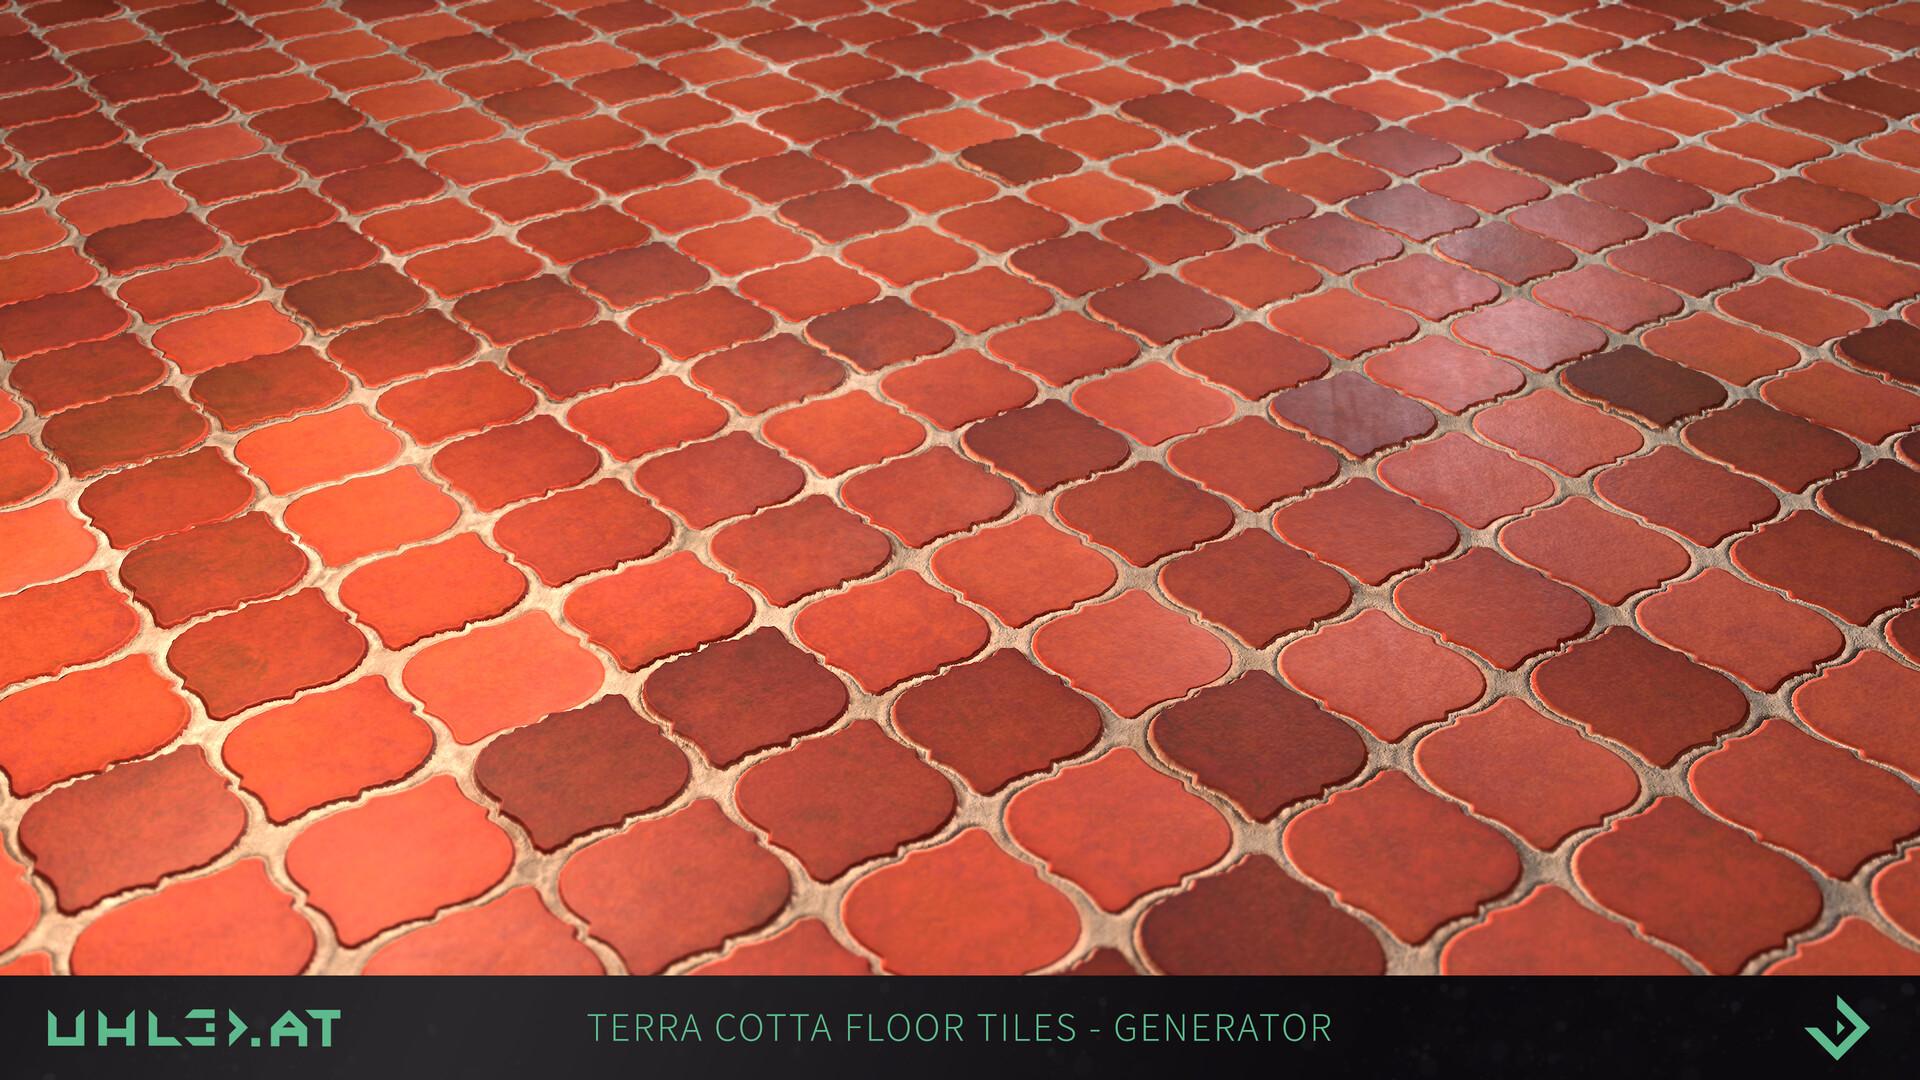 Dominik uhl terracottafloor generator detail 04